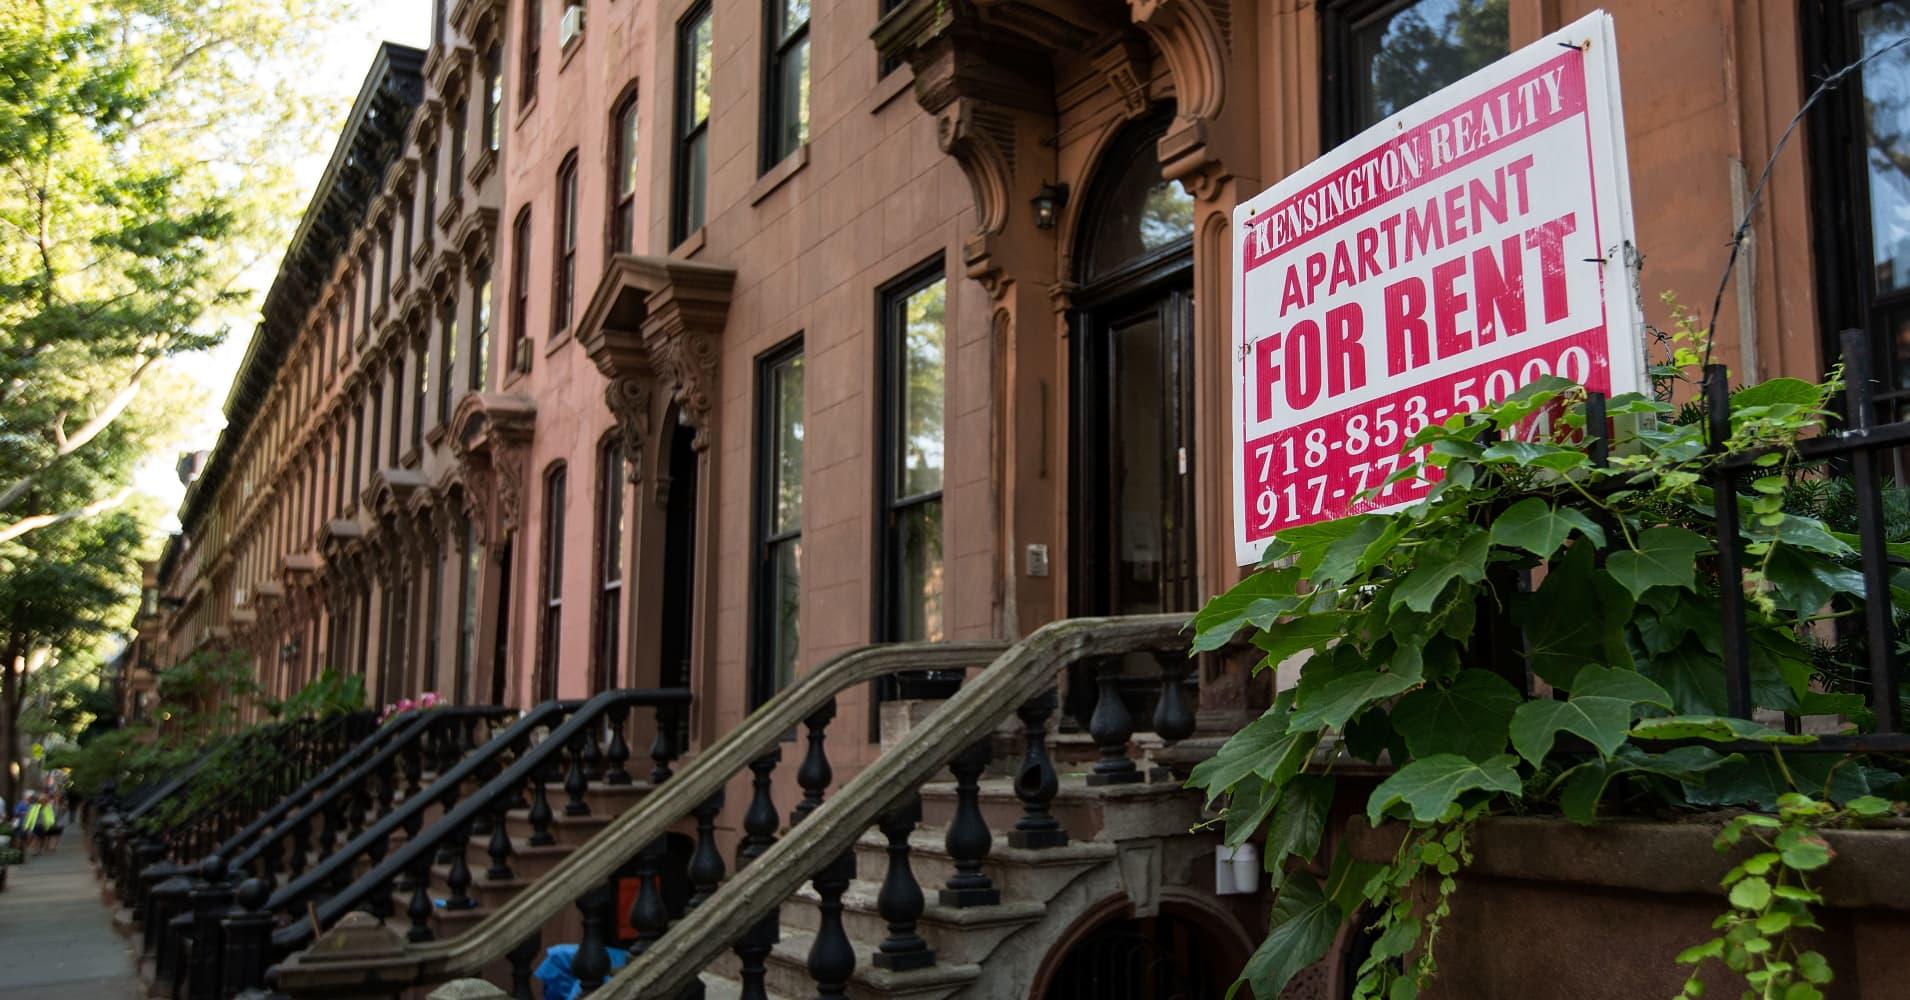 The Fort Greene neighborhood of Brooklyn, New York.